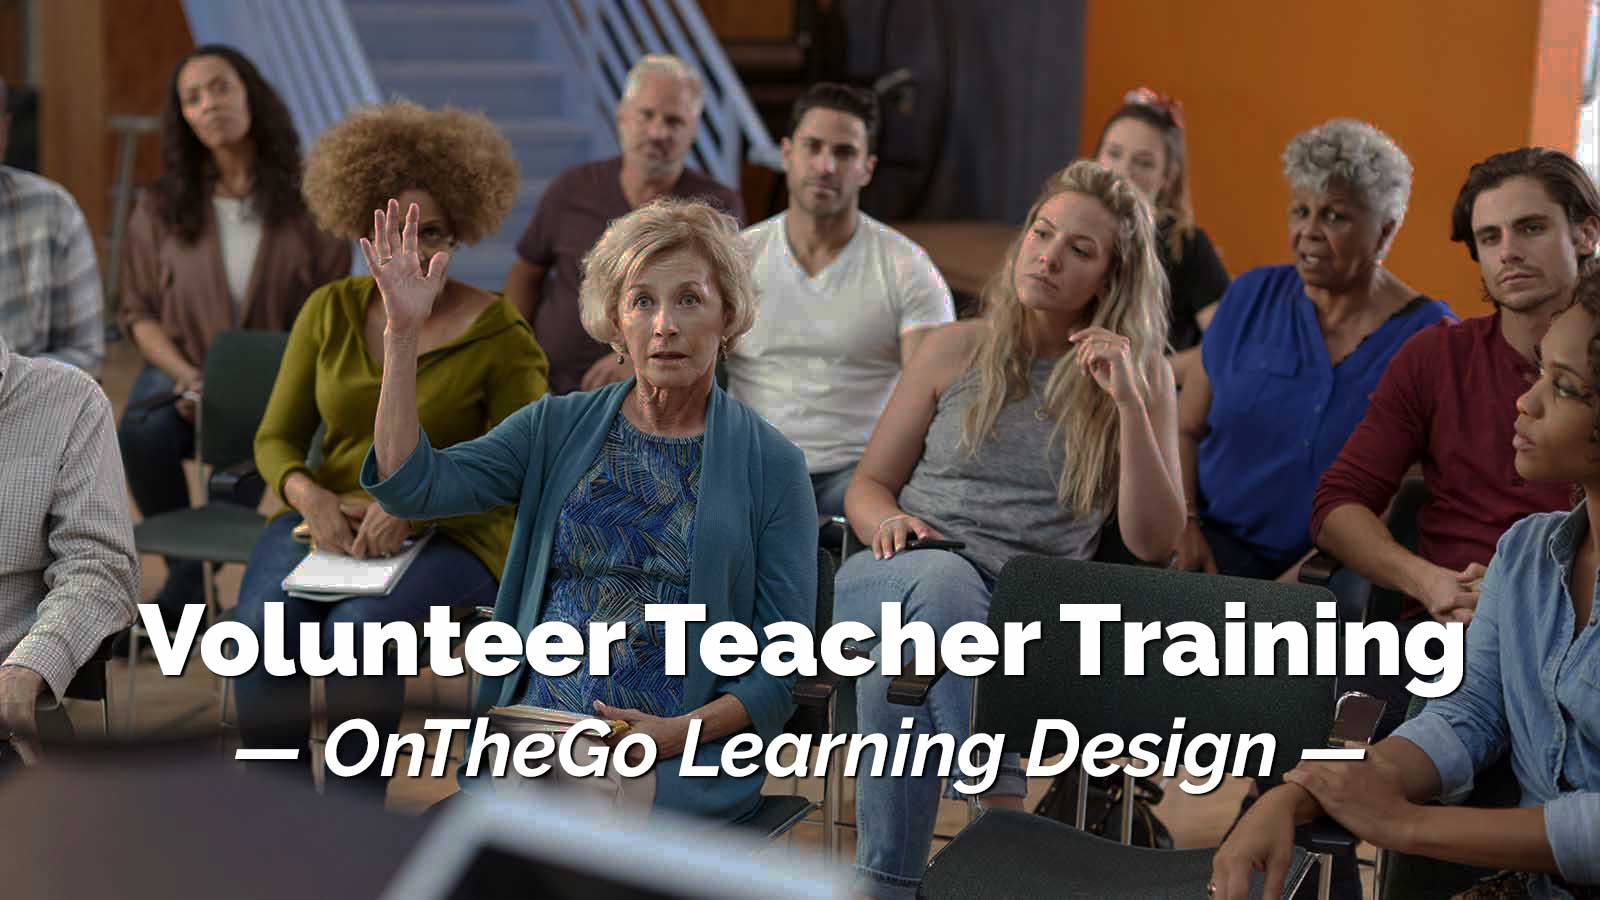 Woman raising hand in class. Volunteer Teacher Training. On the go Learning Design.